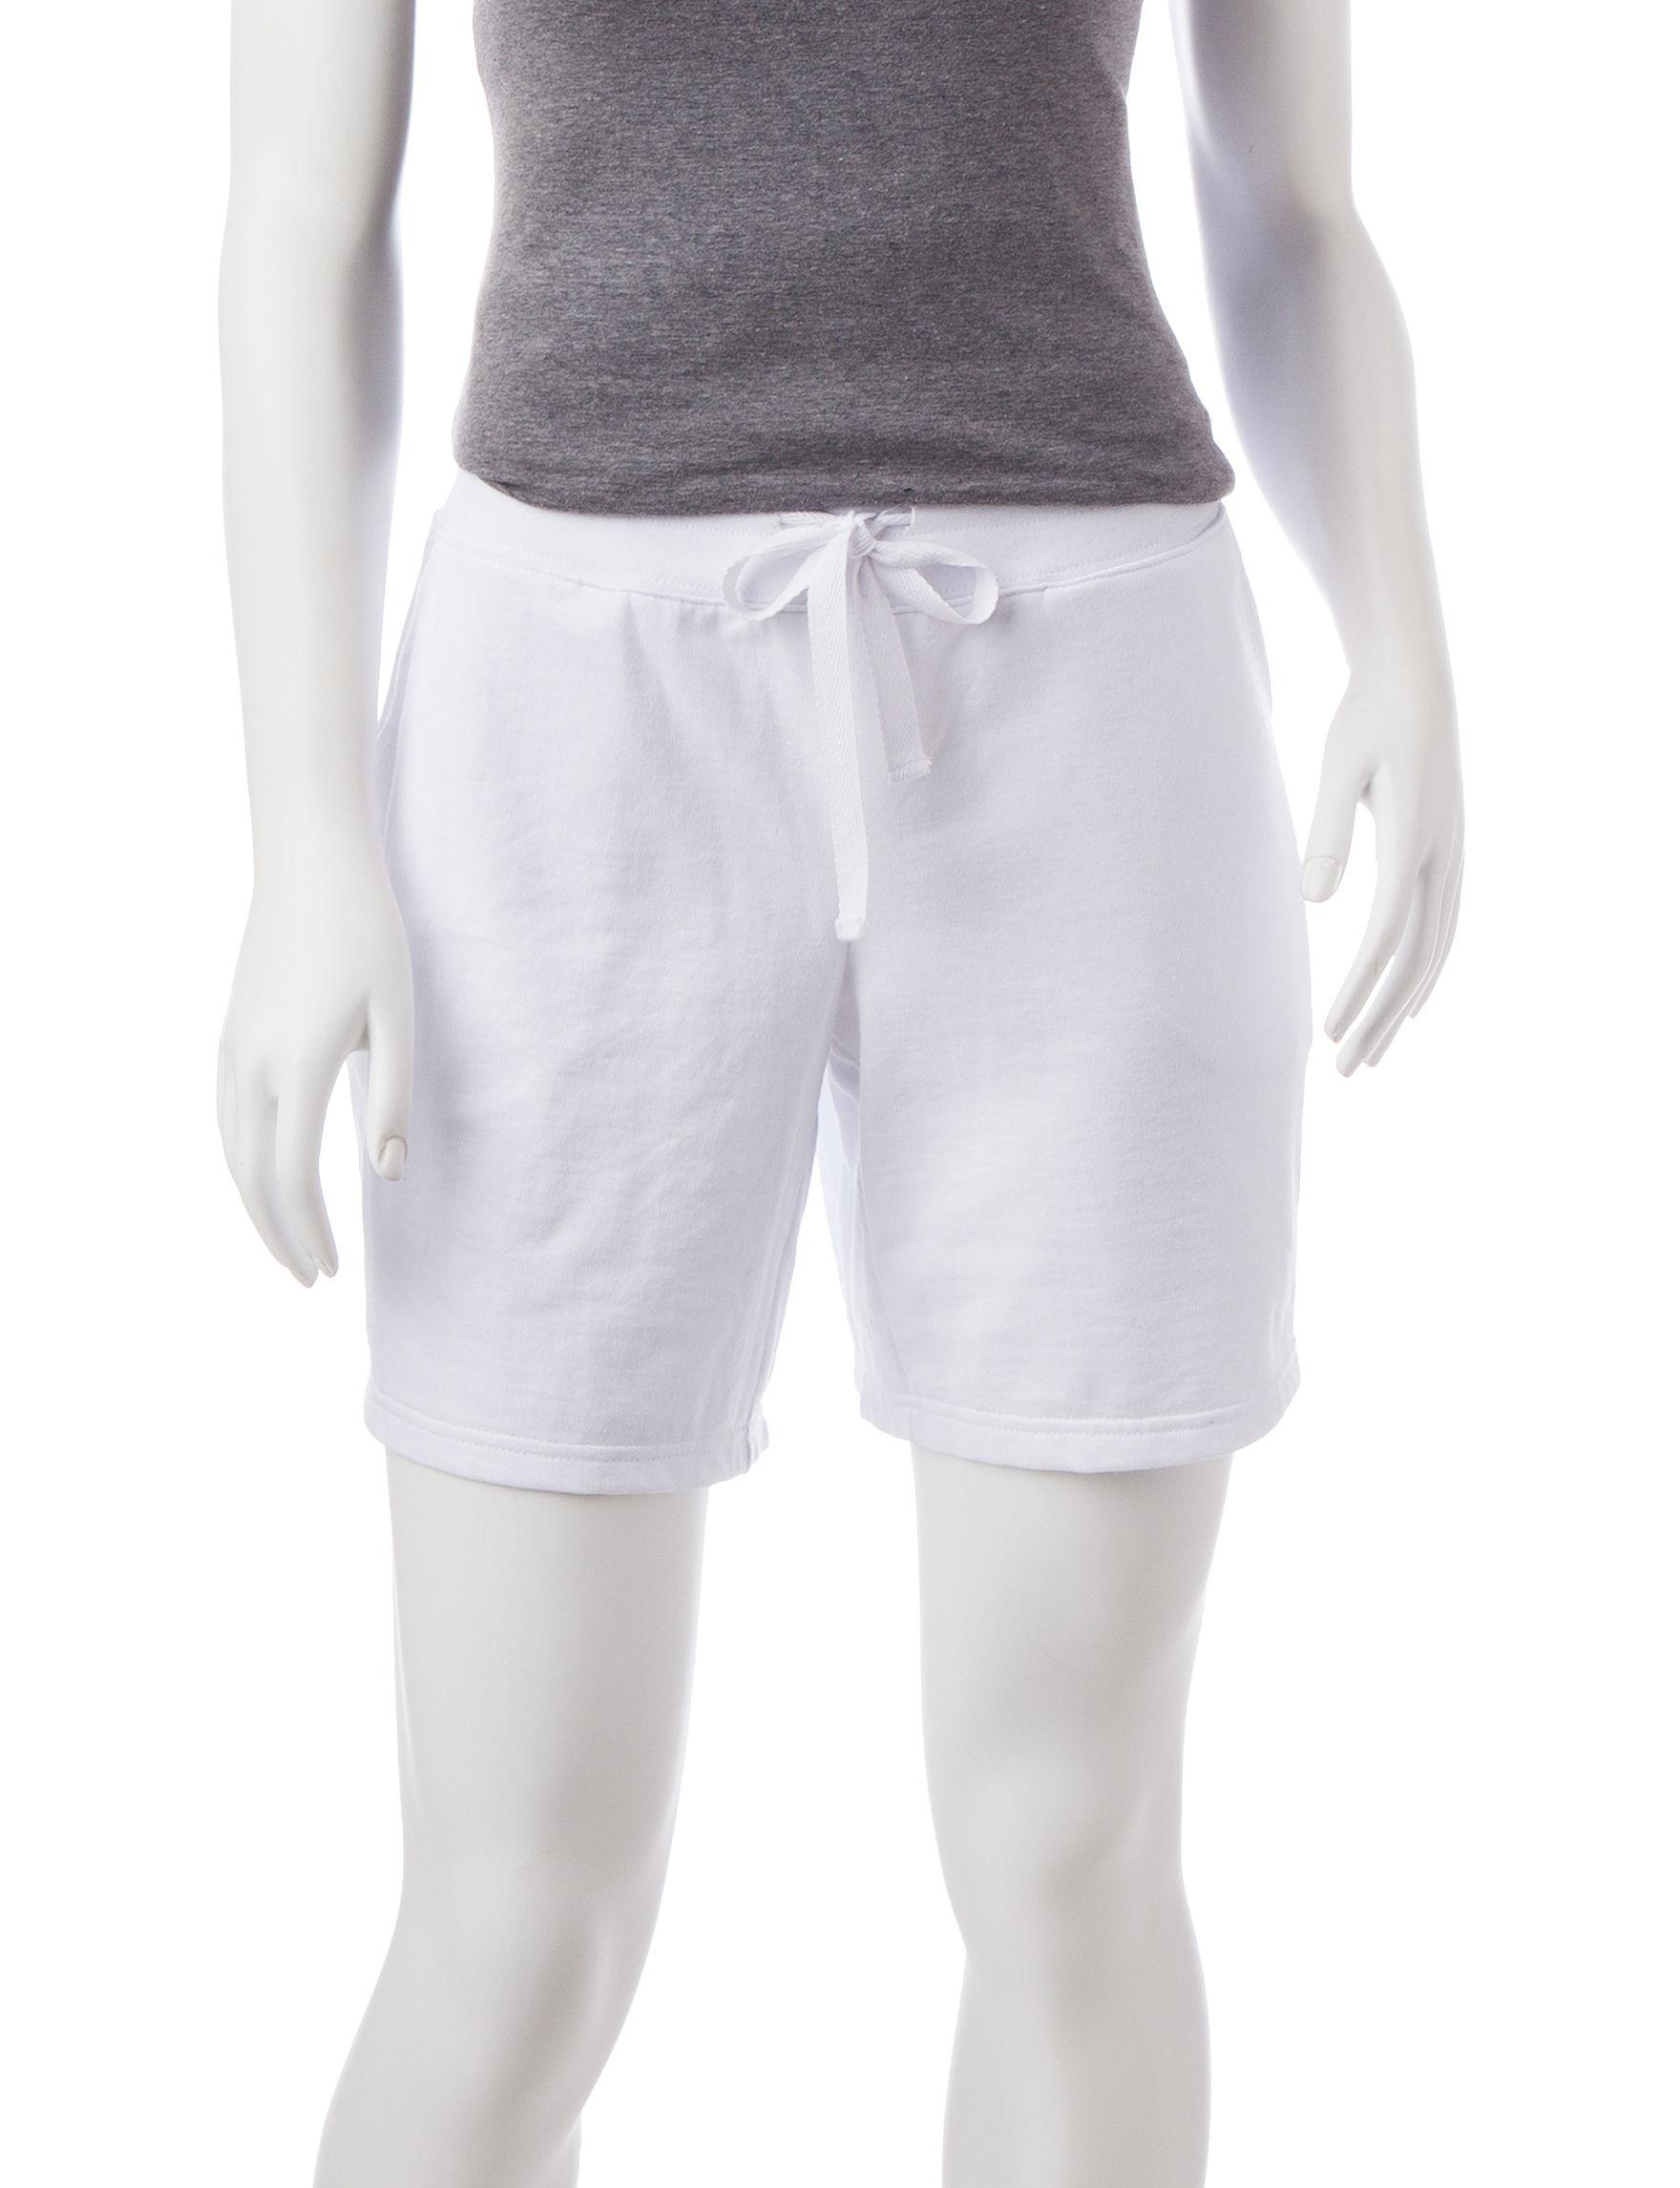 Silverwear White Soft Shorts